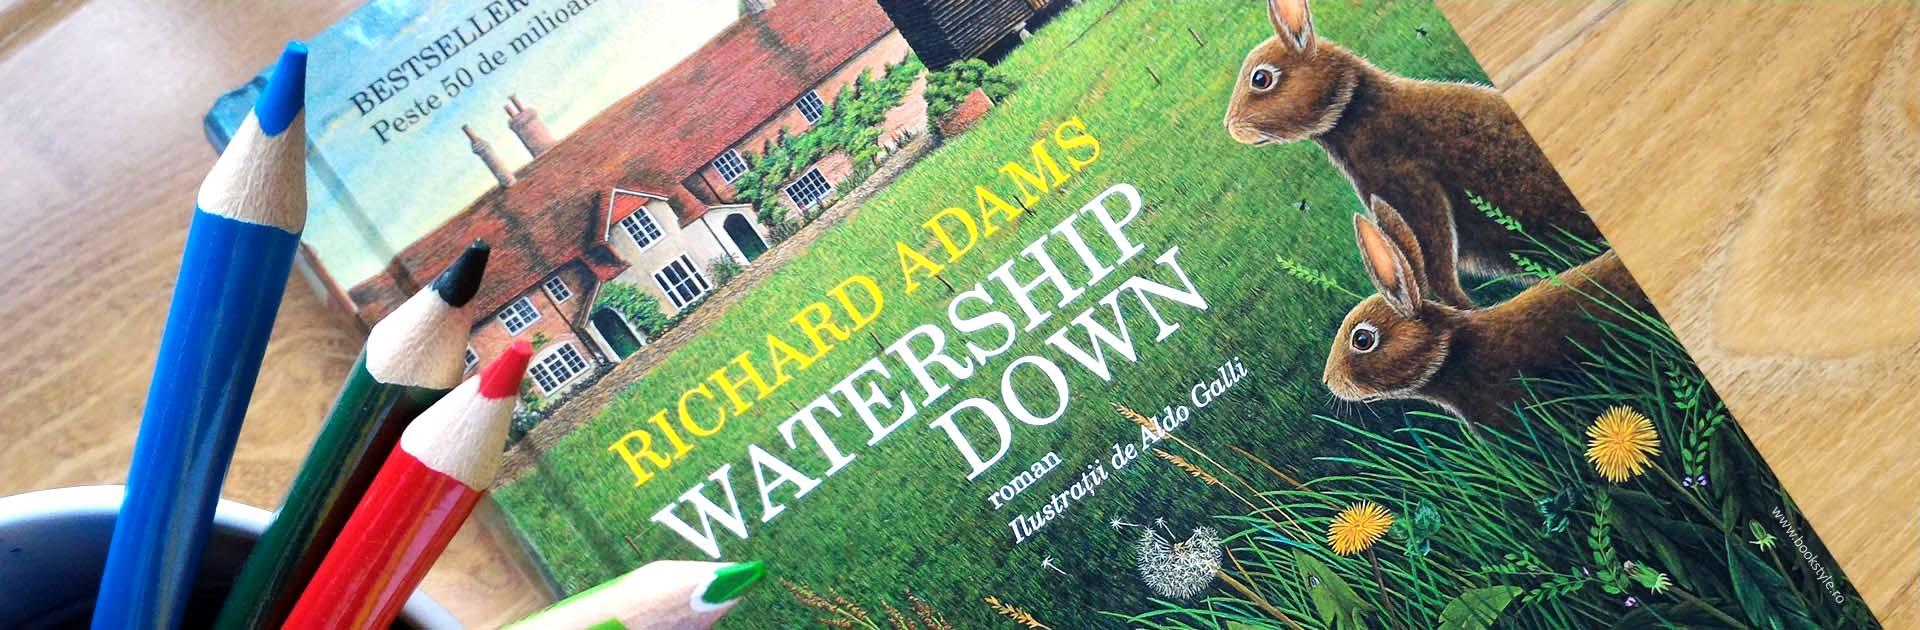 Watership Down - Richard Adams, Editura Humanitas ISBN: 978-973-50-3862-5